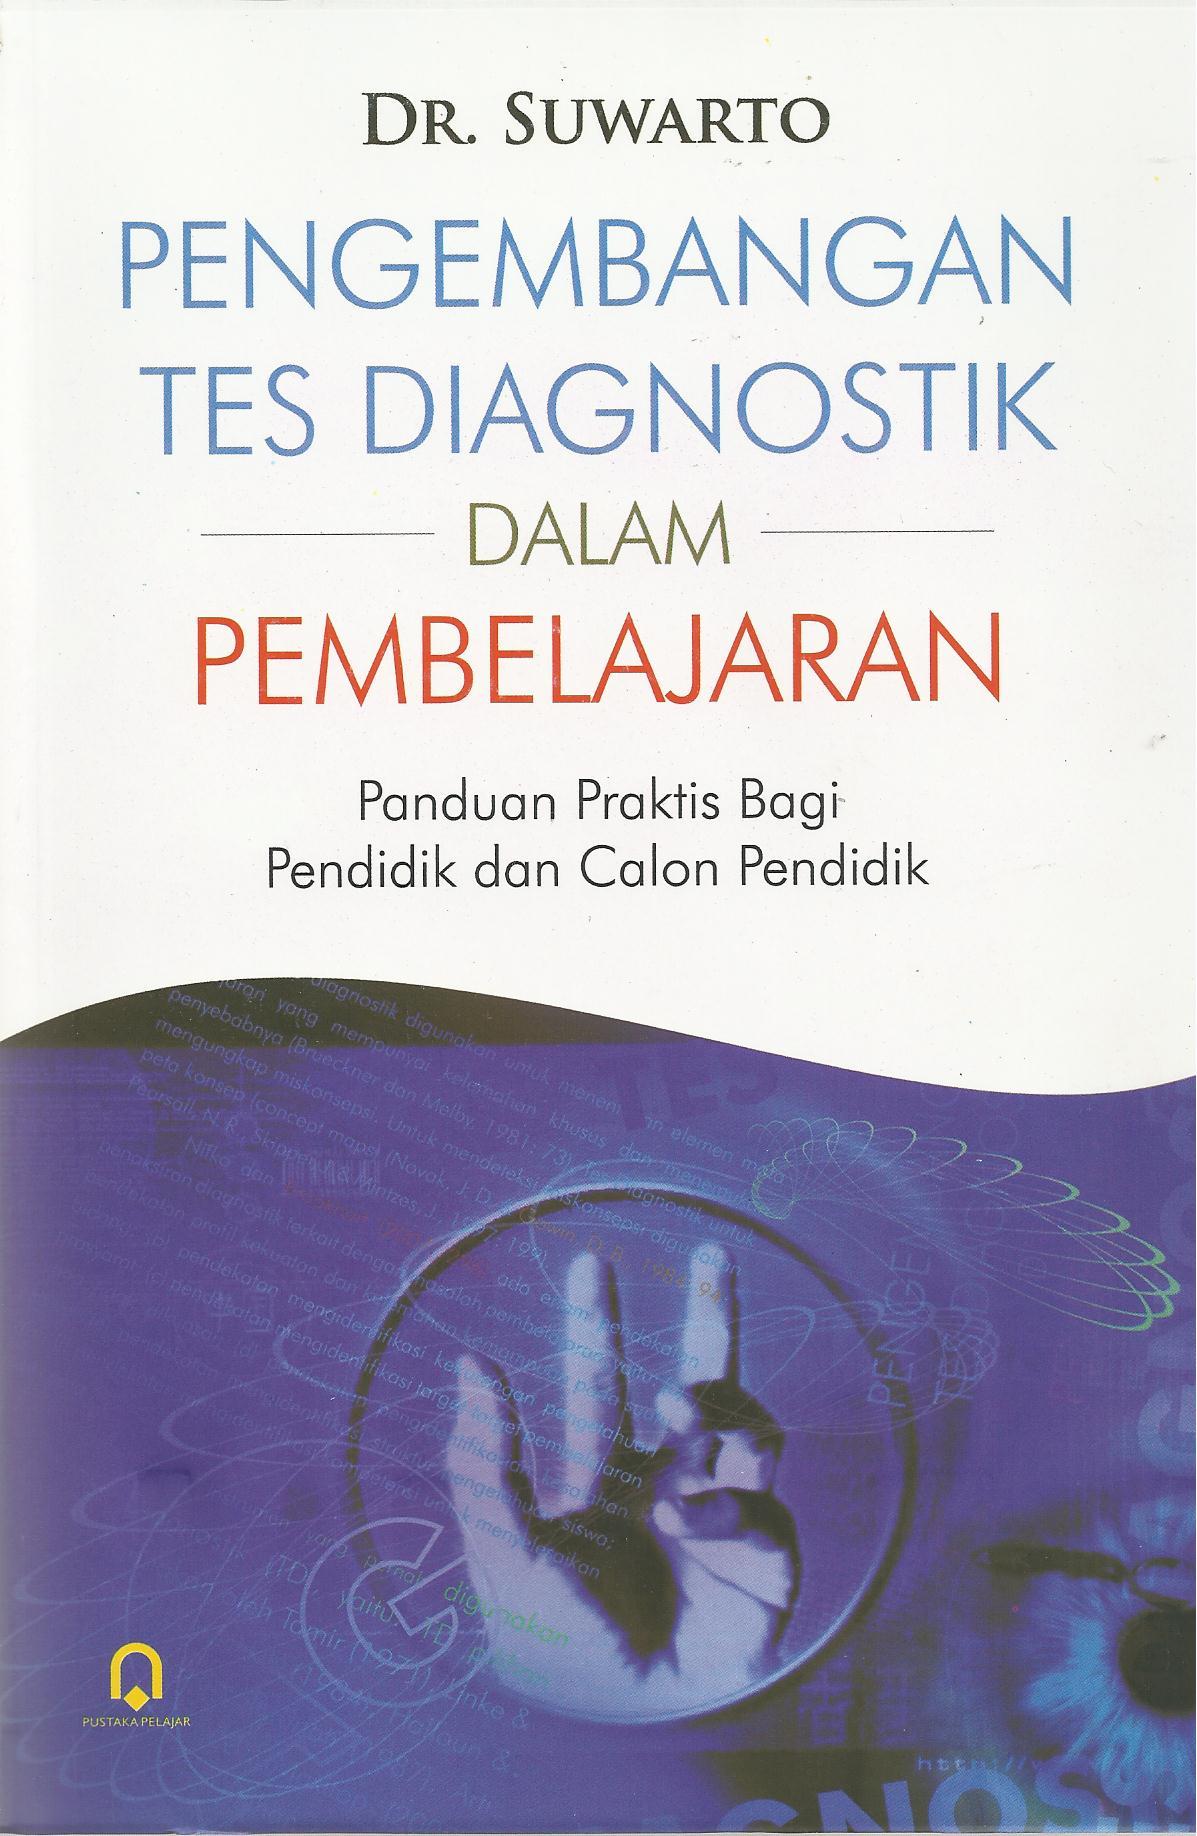 Pengembangan Tes Diagnostik